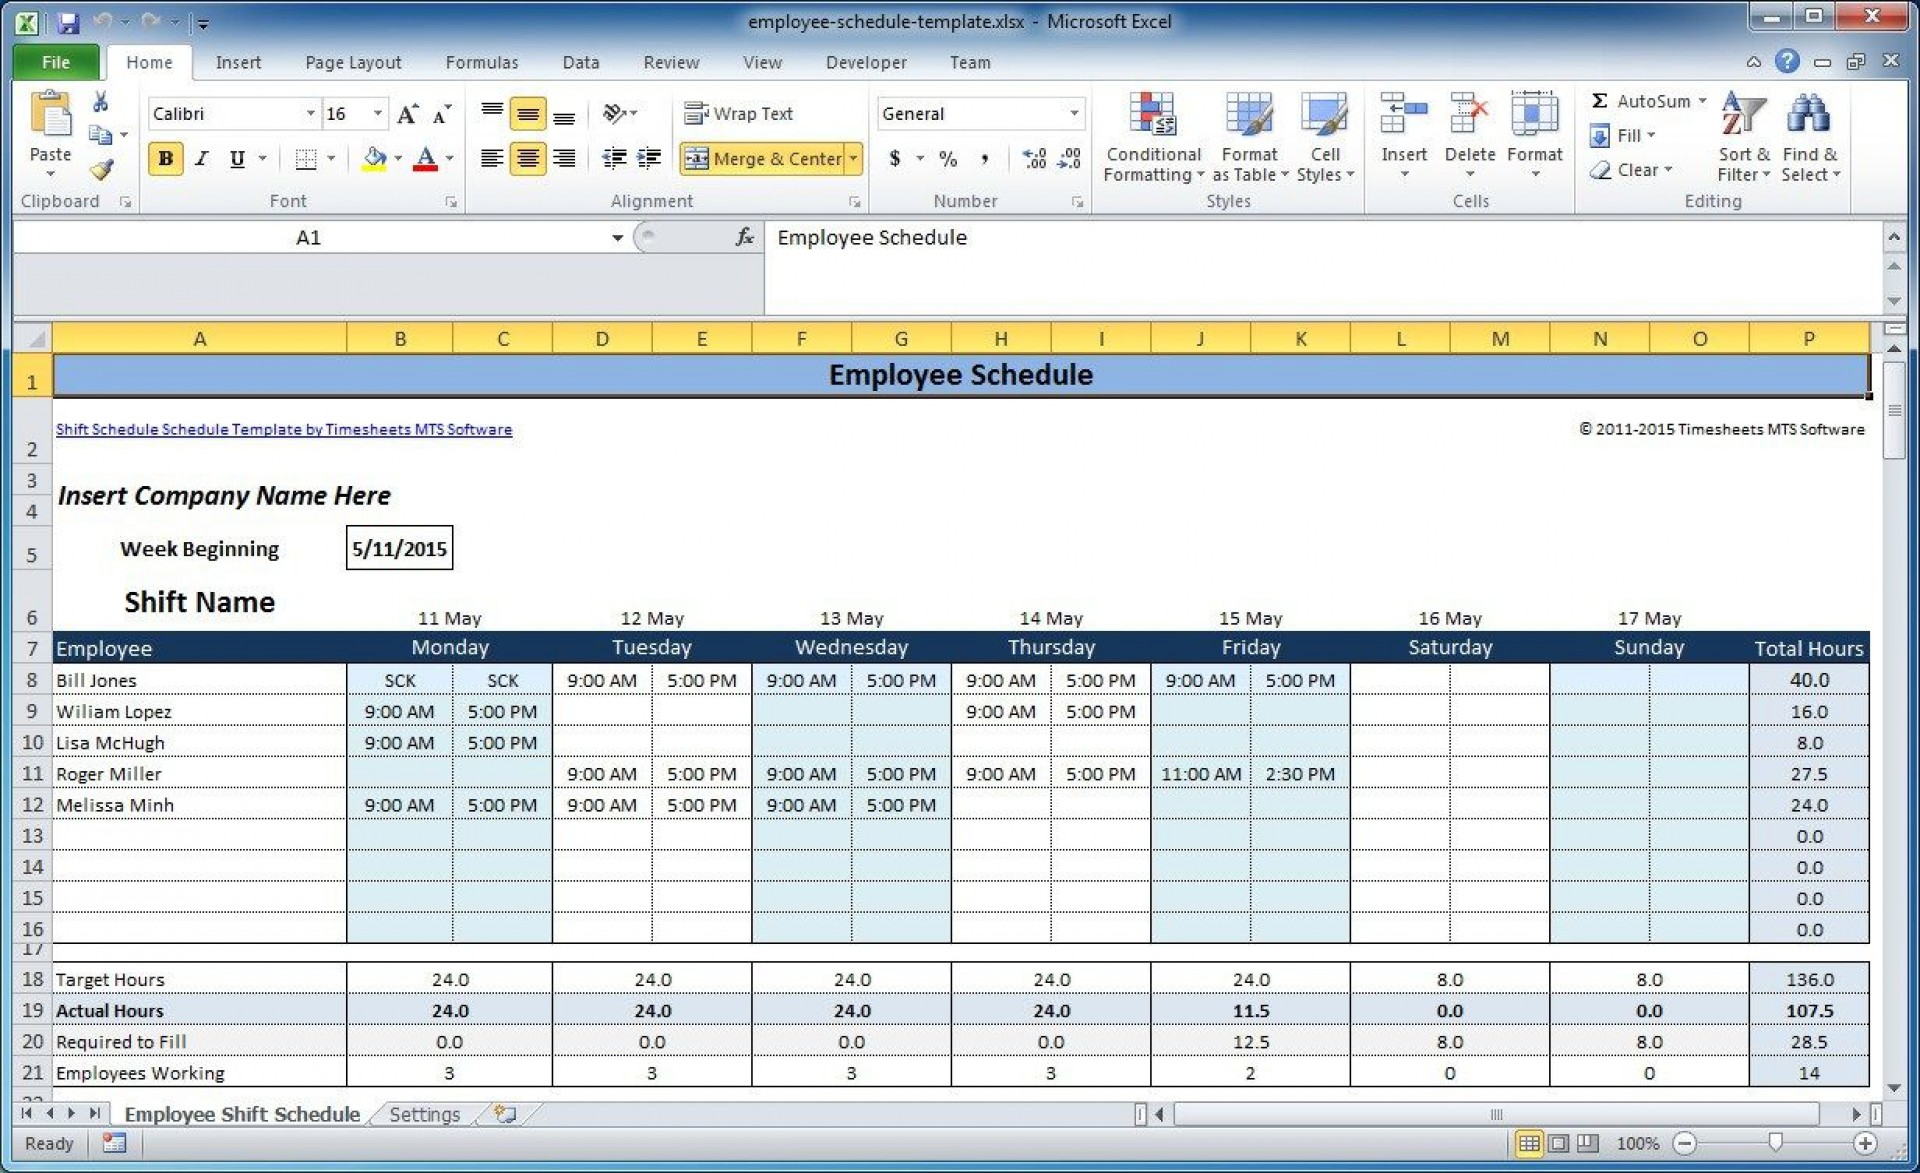 003 Unbelievable Hourly Work Schedule Template Word High Resolution 1920